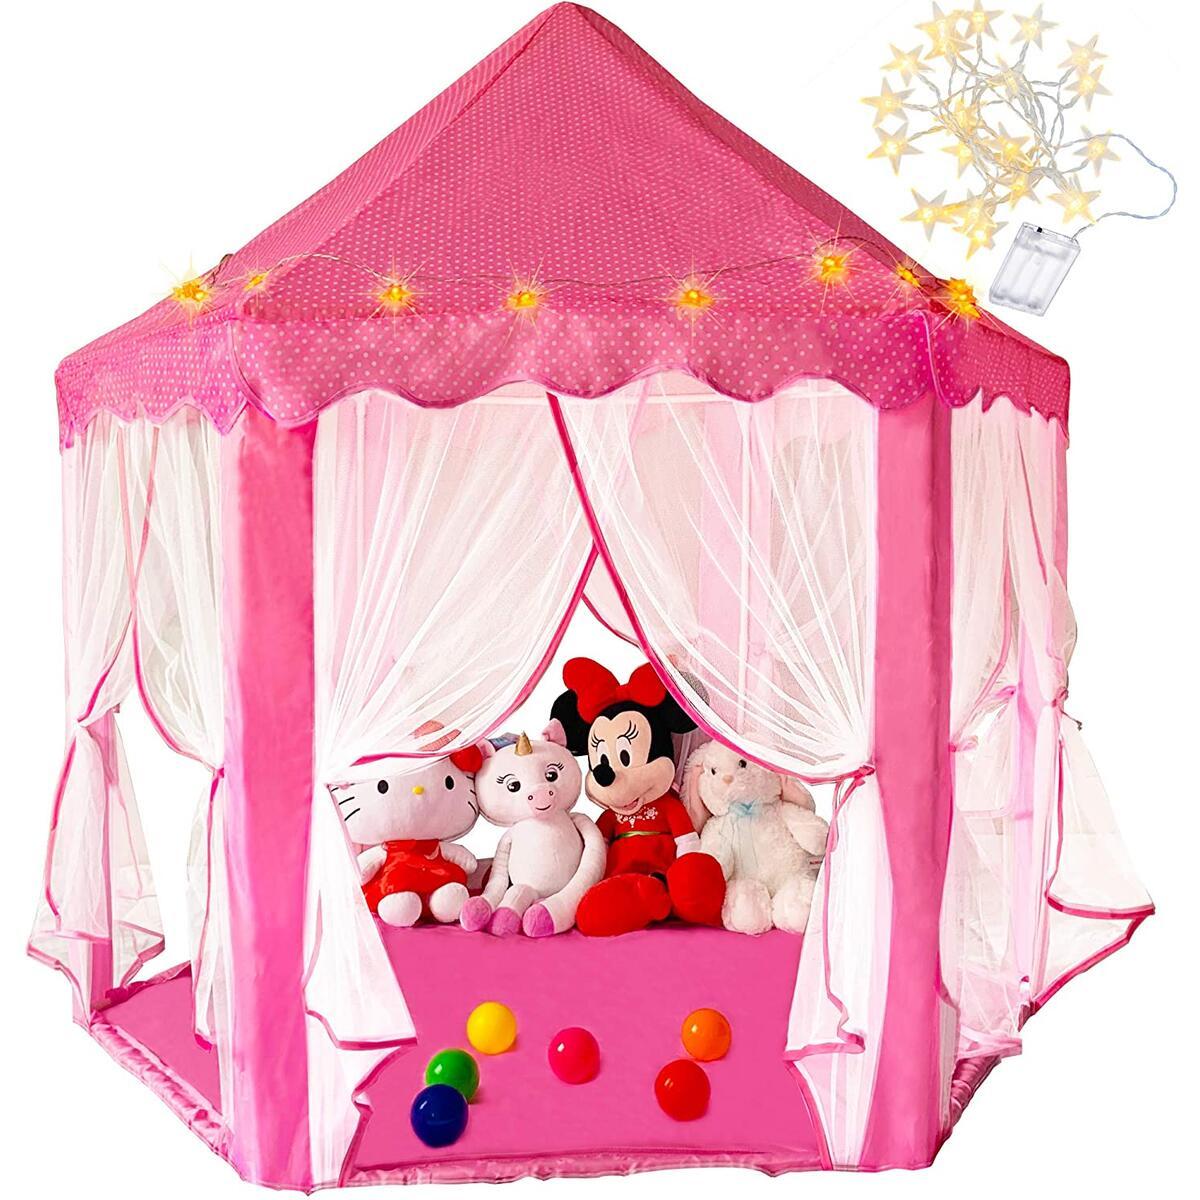 Princess Play Tent With Lights